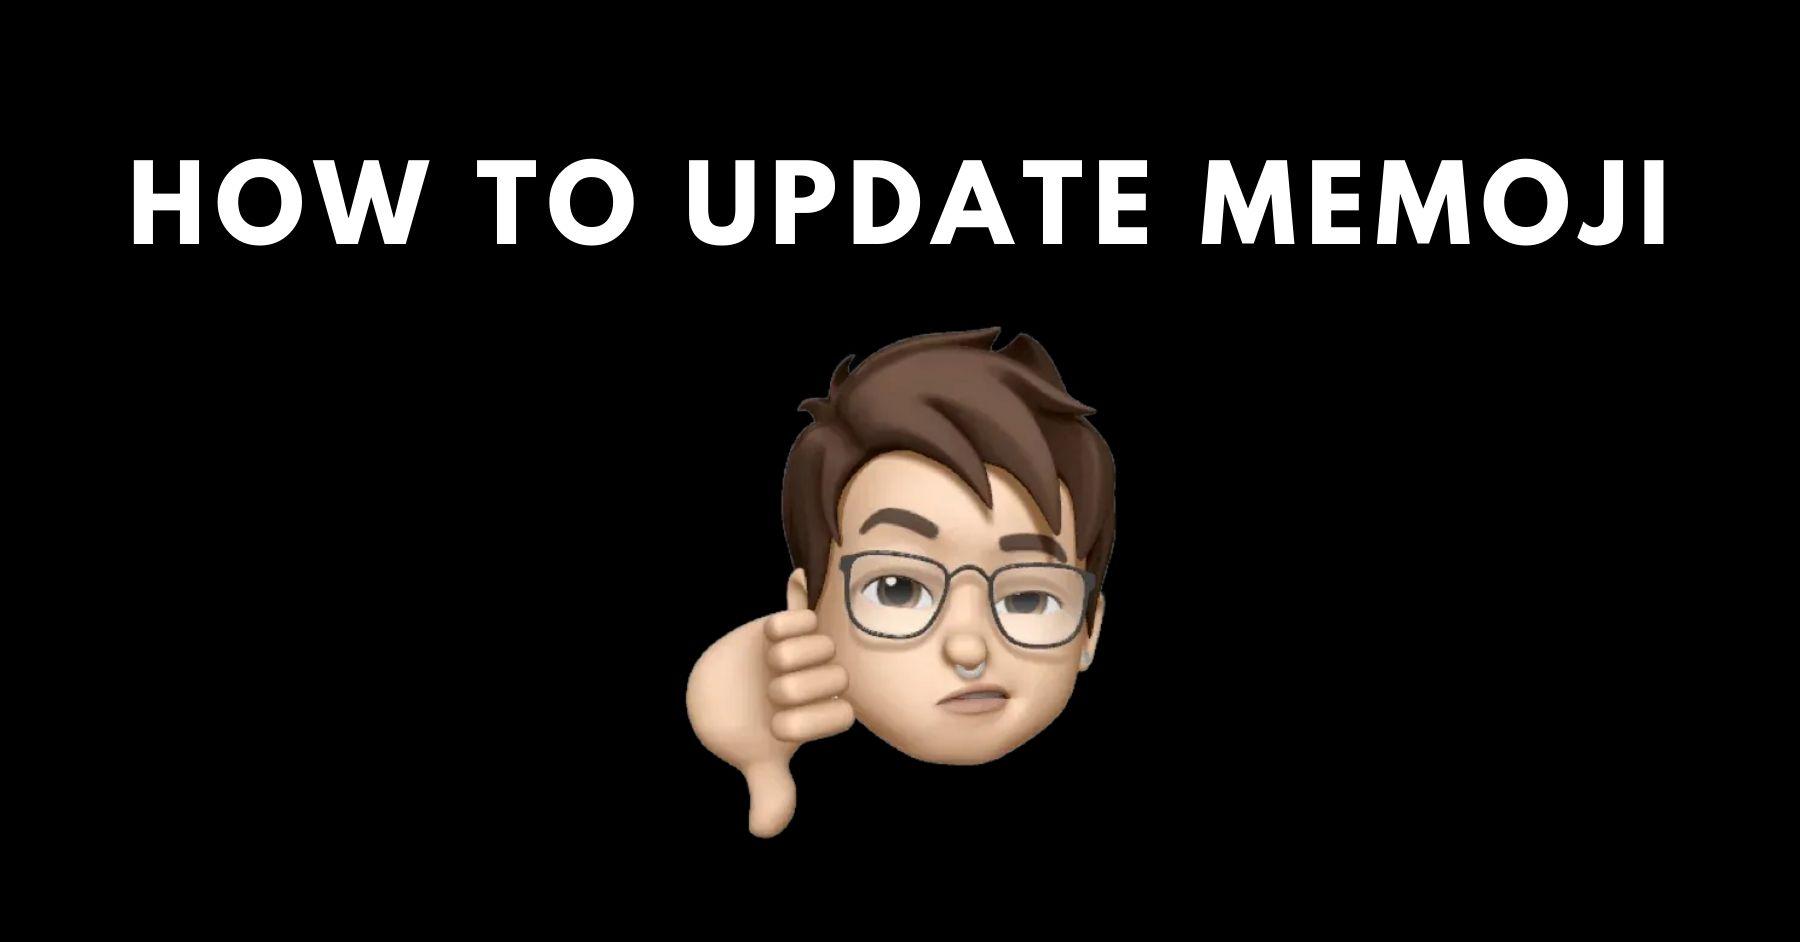 How to Update Memoji